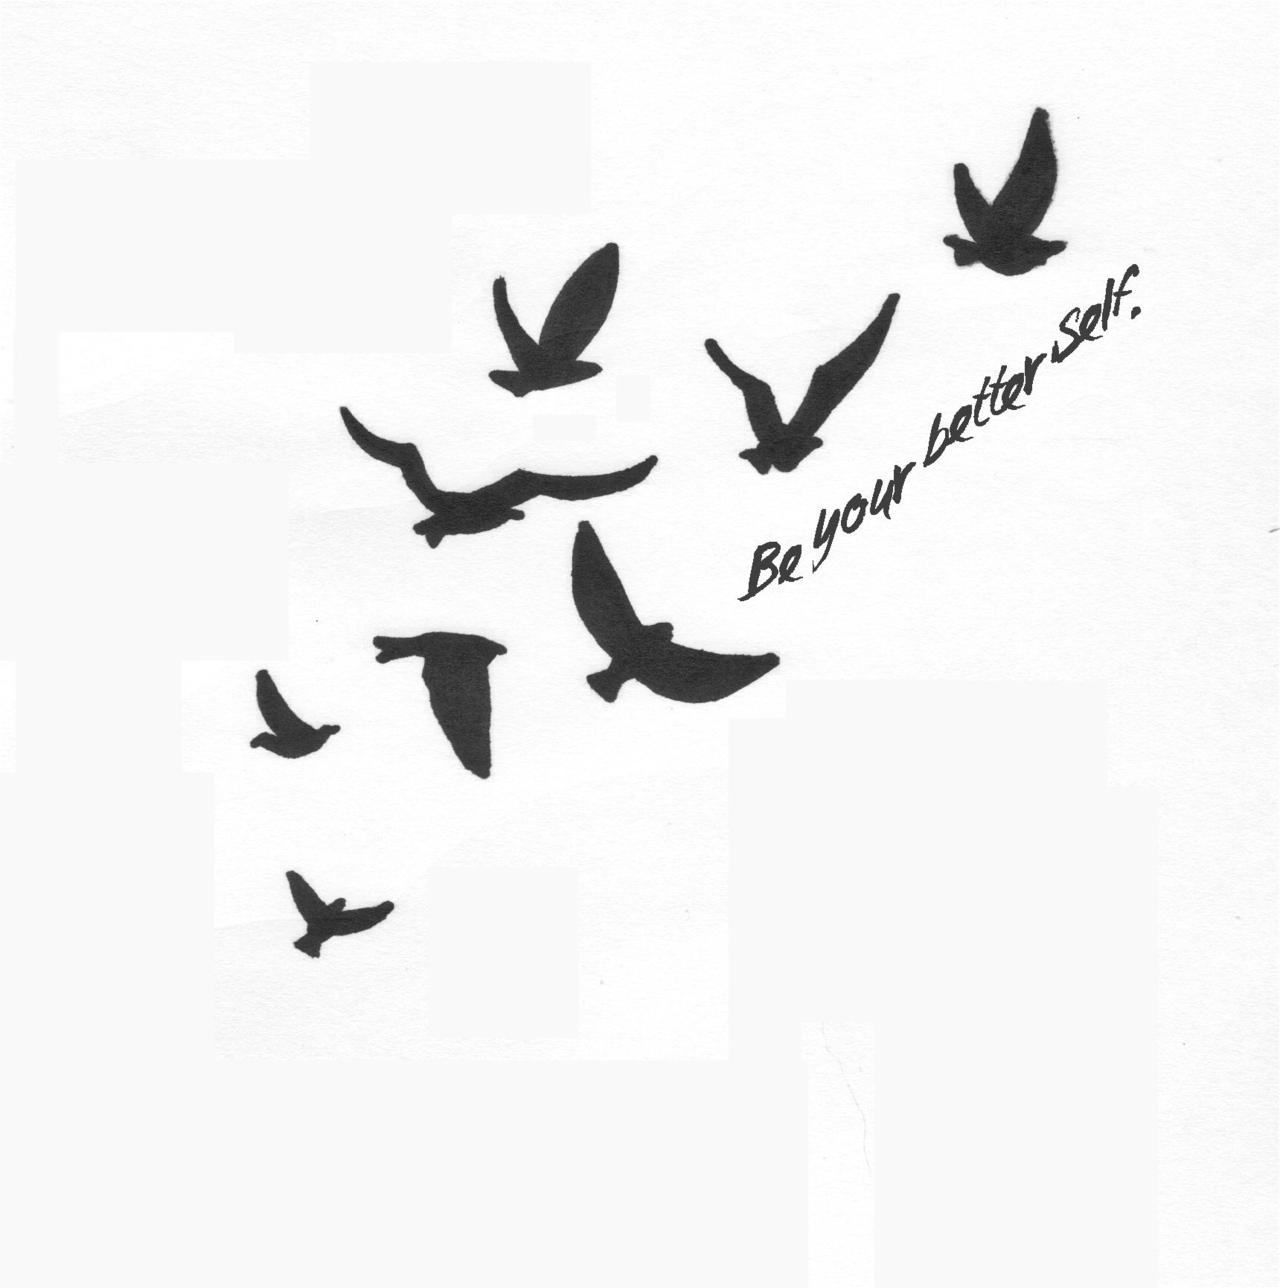 Bird Tattoos Designs Ideas And Meaning: 38+ Unique Birds Tattoos Designs